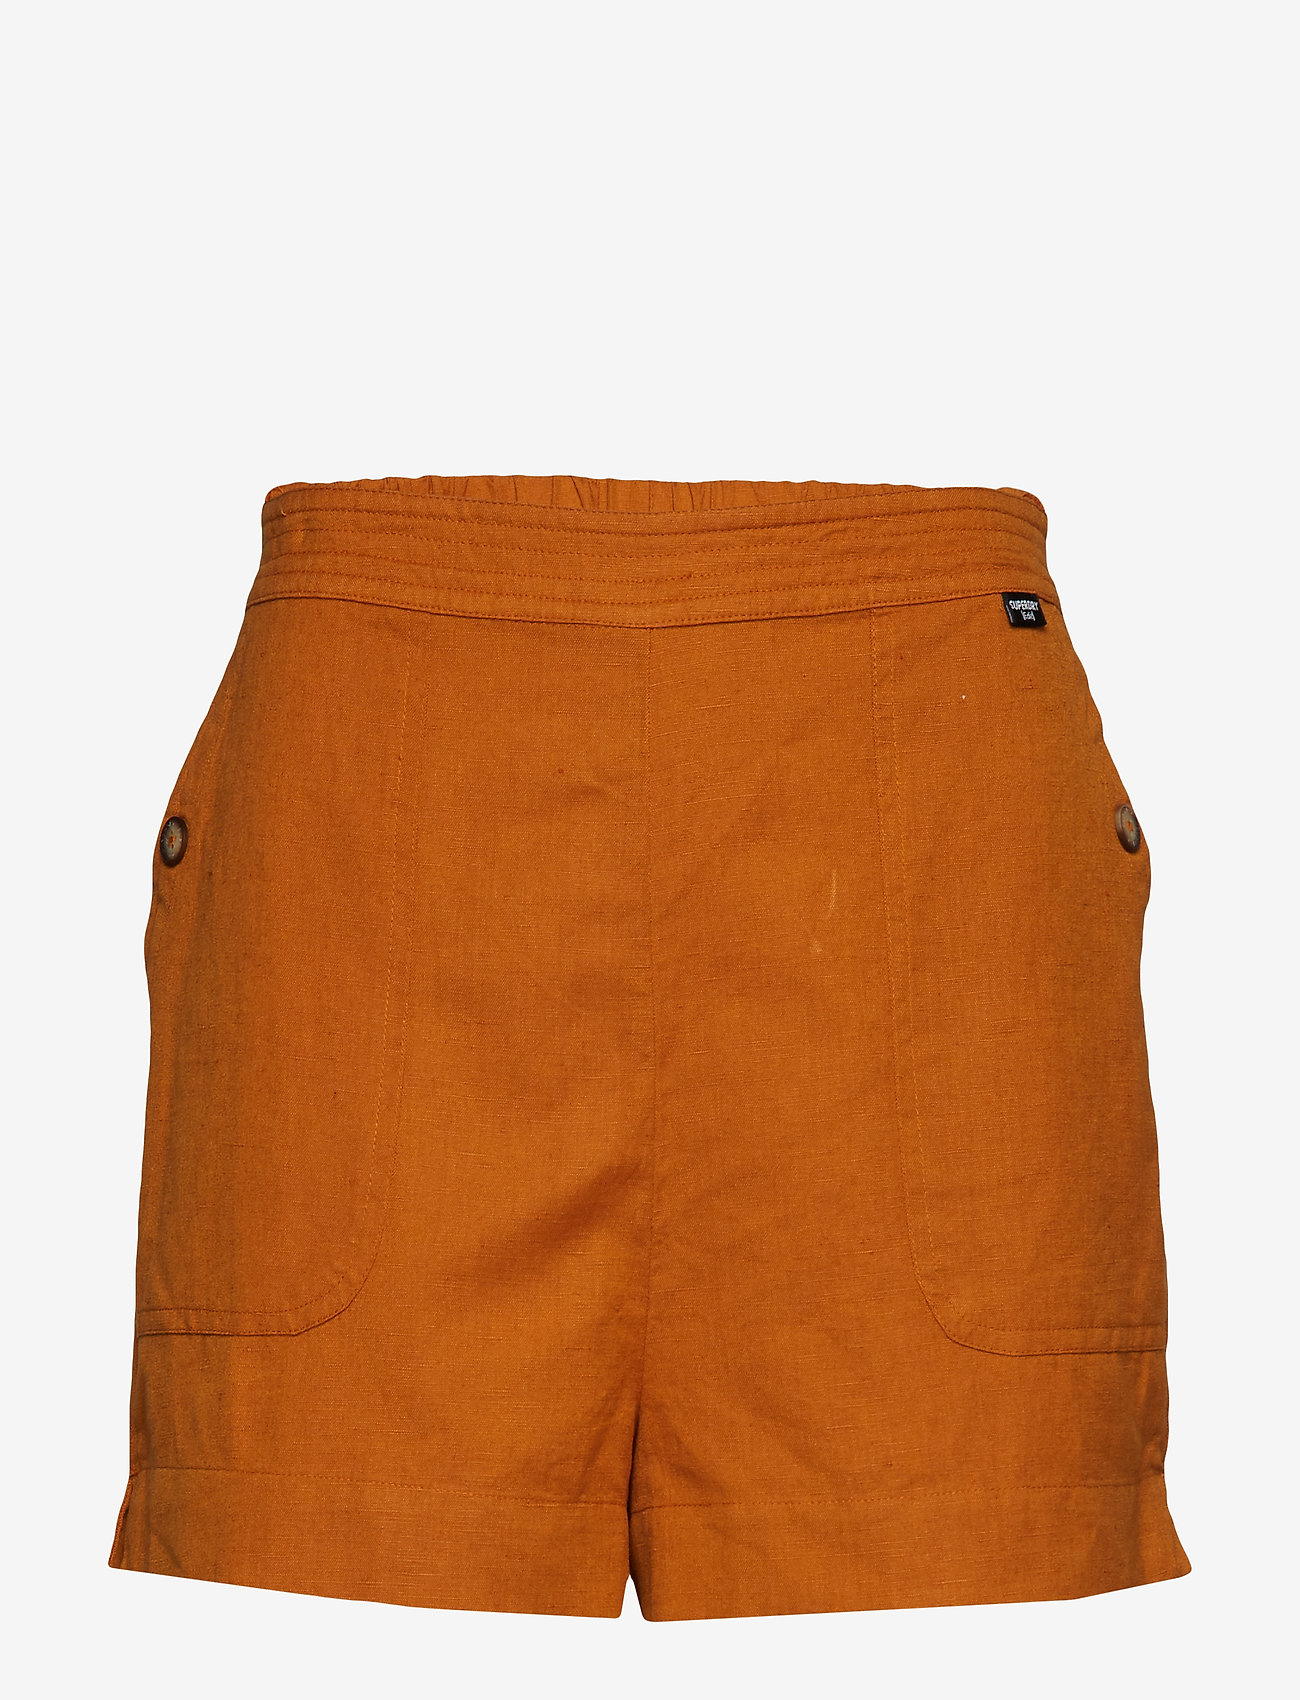 Superdry - MILA CULOTTE SHORTS - shorts casual - ochre - 0